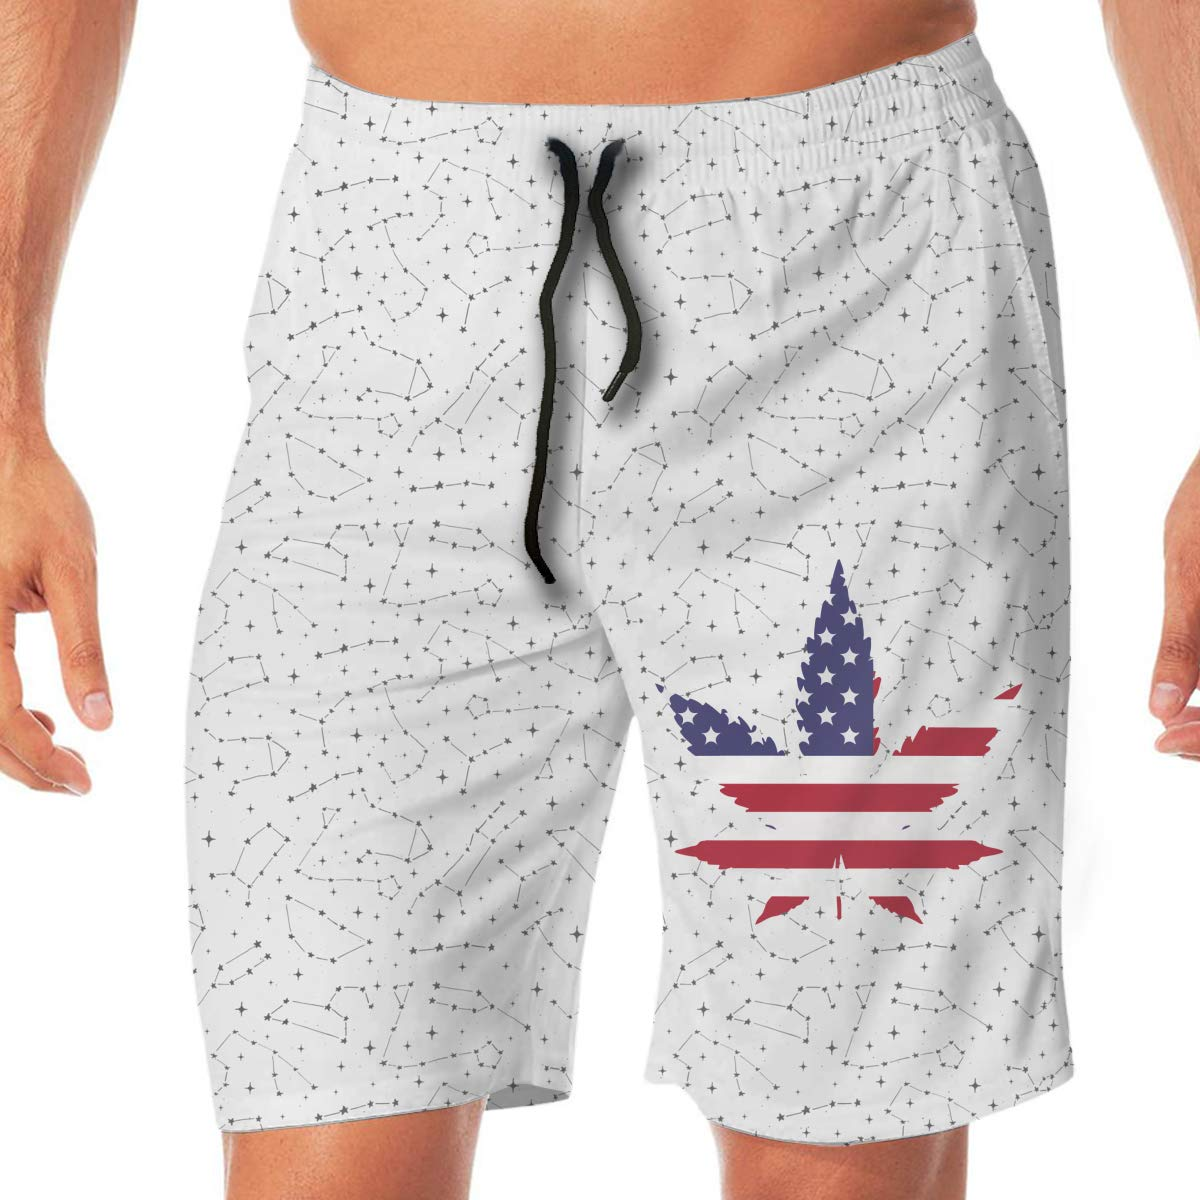 Mens American Weed Leaf Boardshorts Swimming Shorts No Mesh Lining